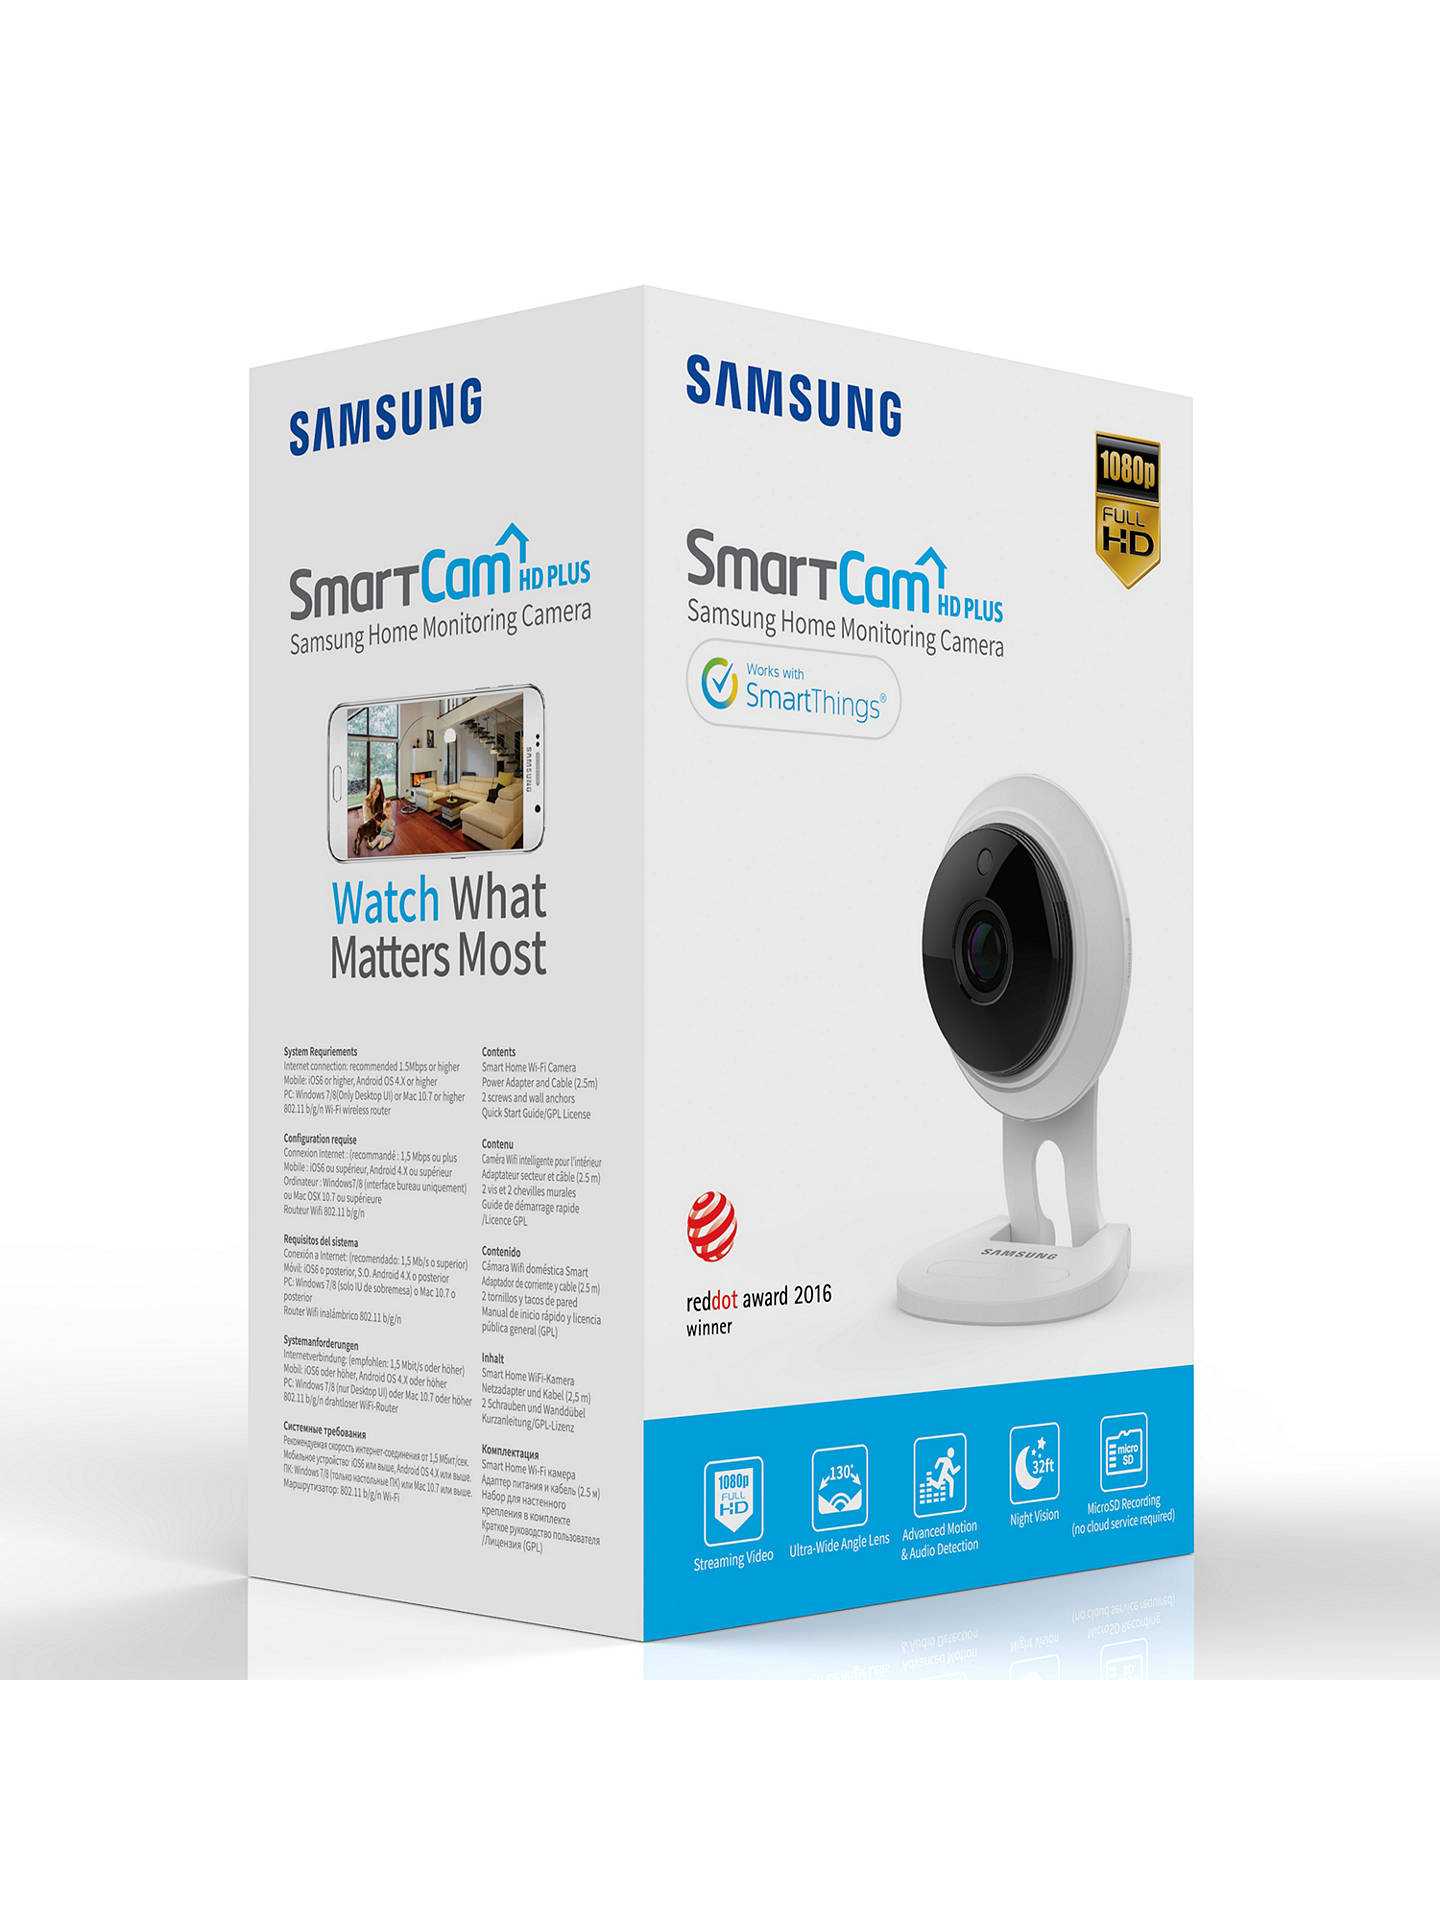 Samsung Smartcam HD PLUS 1080p Wi-Fi Camera